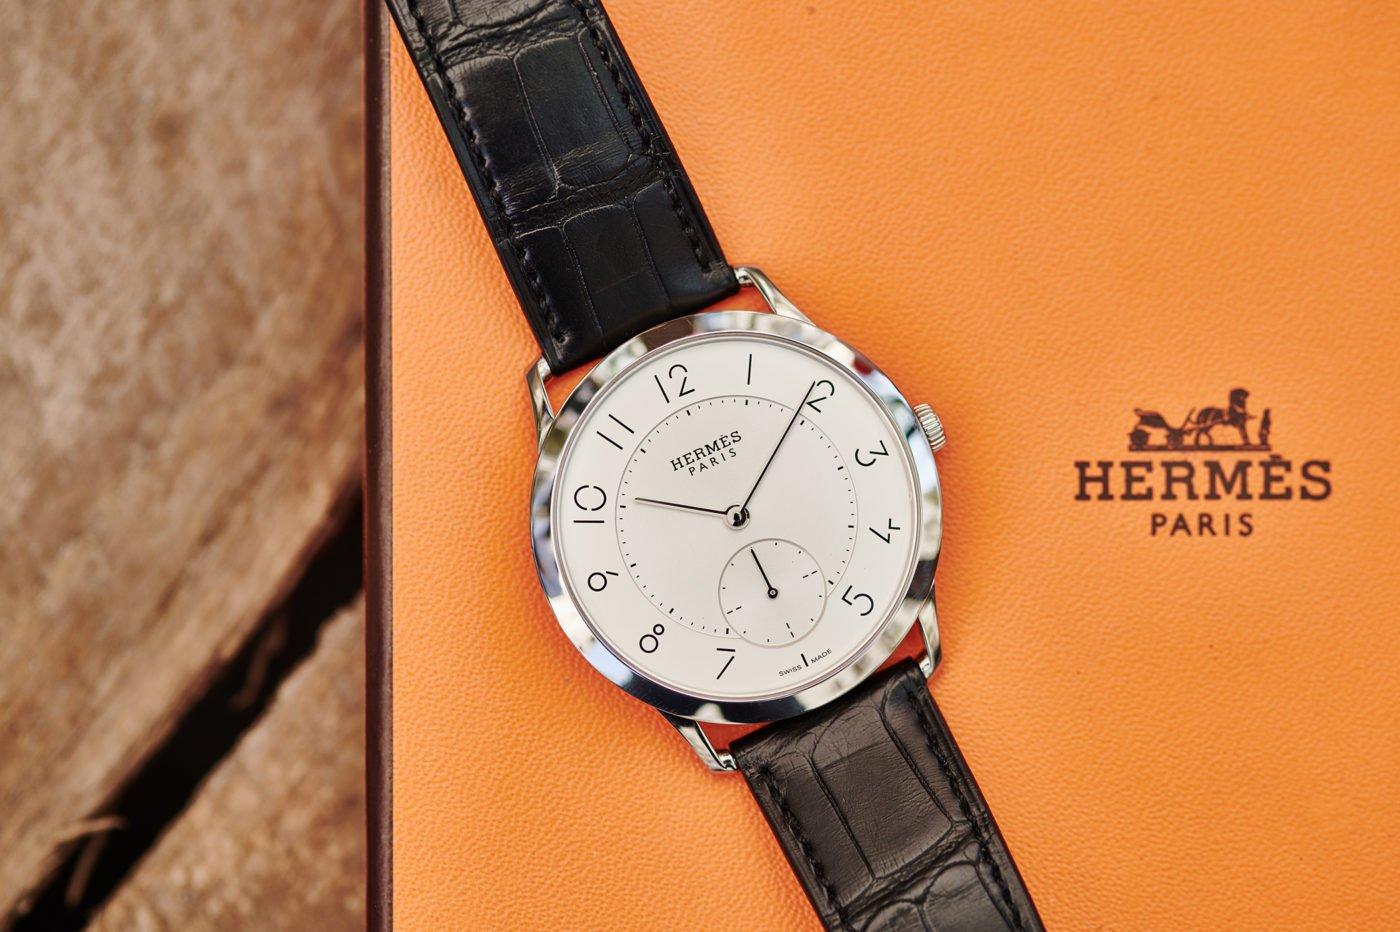 Recenzja Hermès Slim d'Hermès [zdjęcia live, cena]